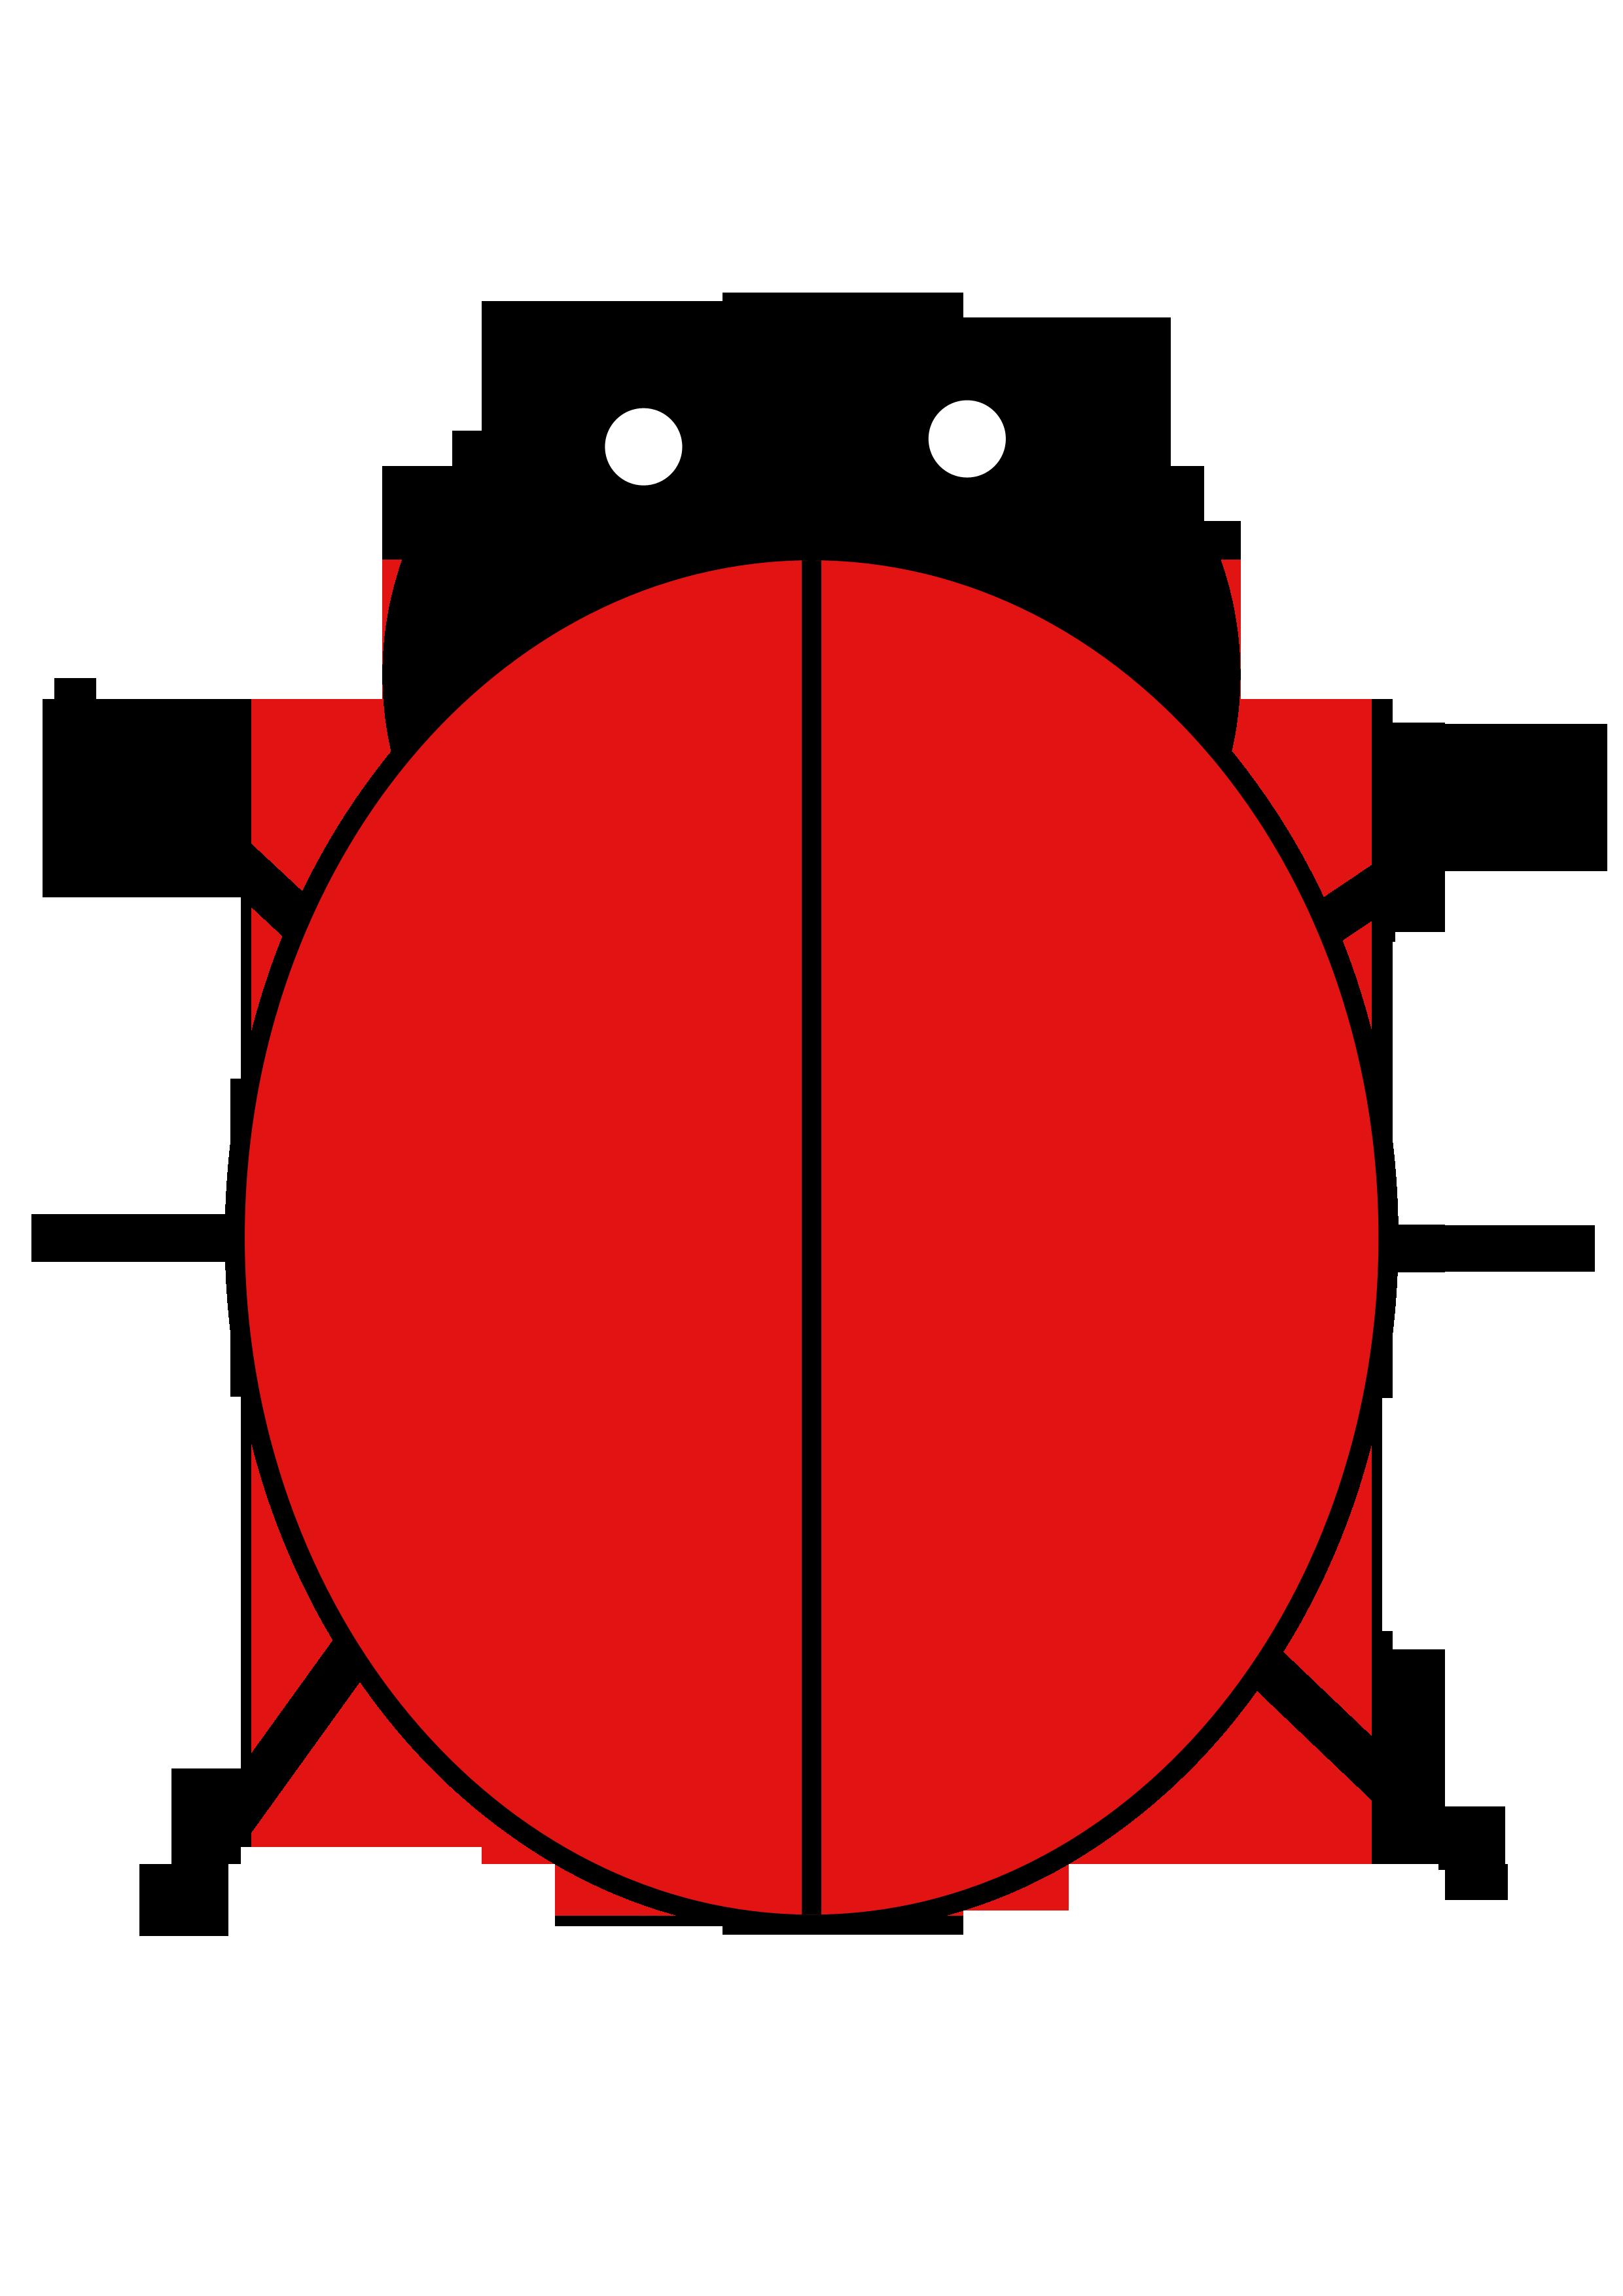 Number clipart ladybug #15